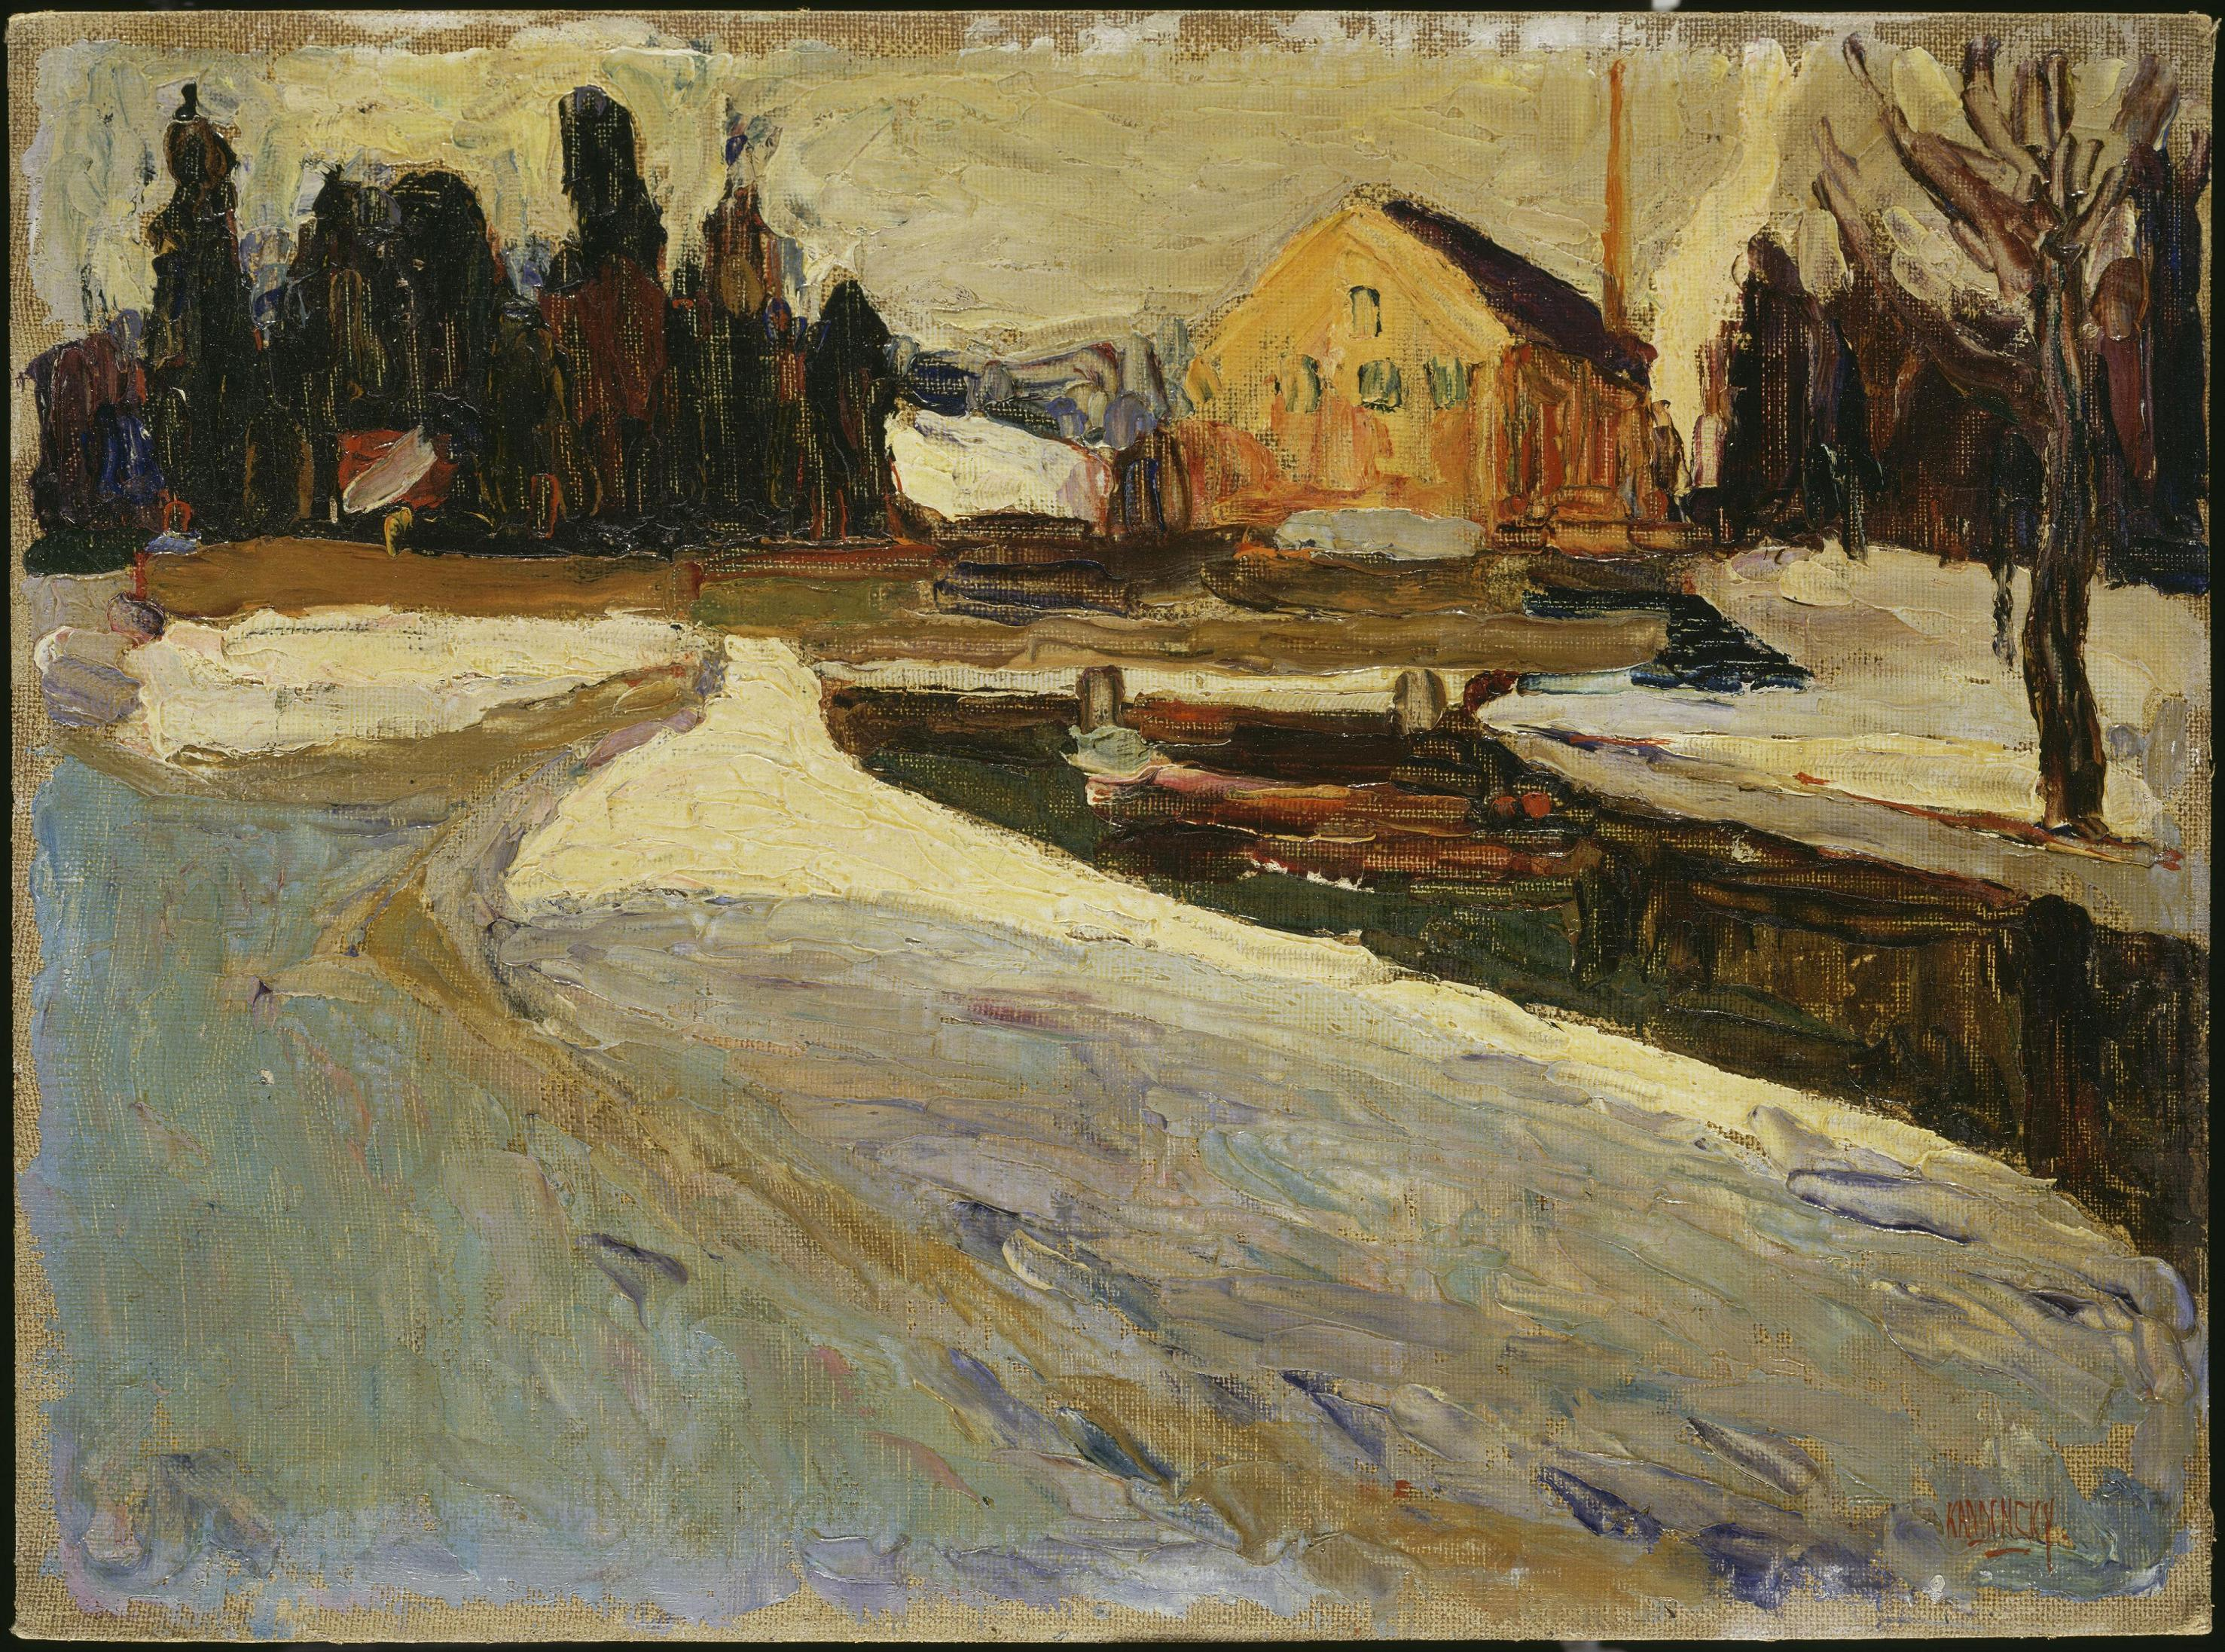 Schwabing, Wintersonne (Schwabing: Sol de invierno), 1901. © Vassily Kandinsky, VEGAP, Madrid 2015.